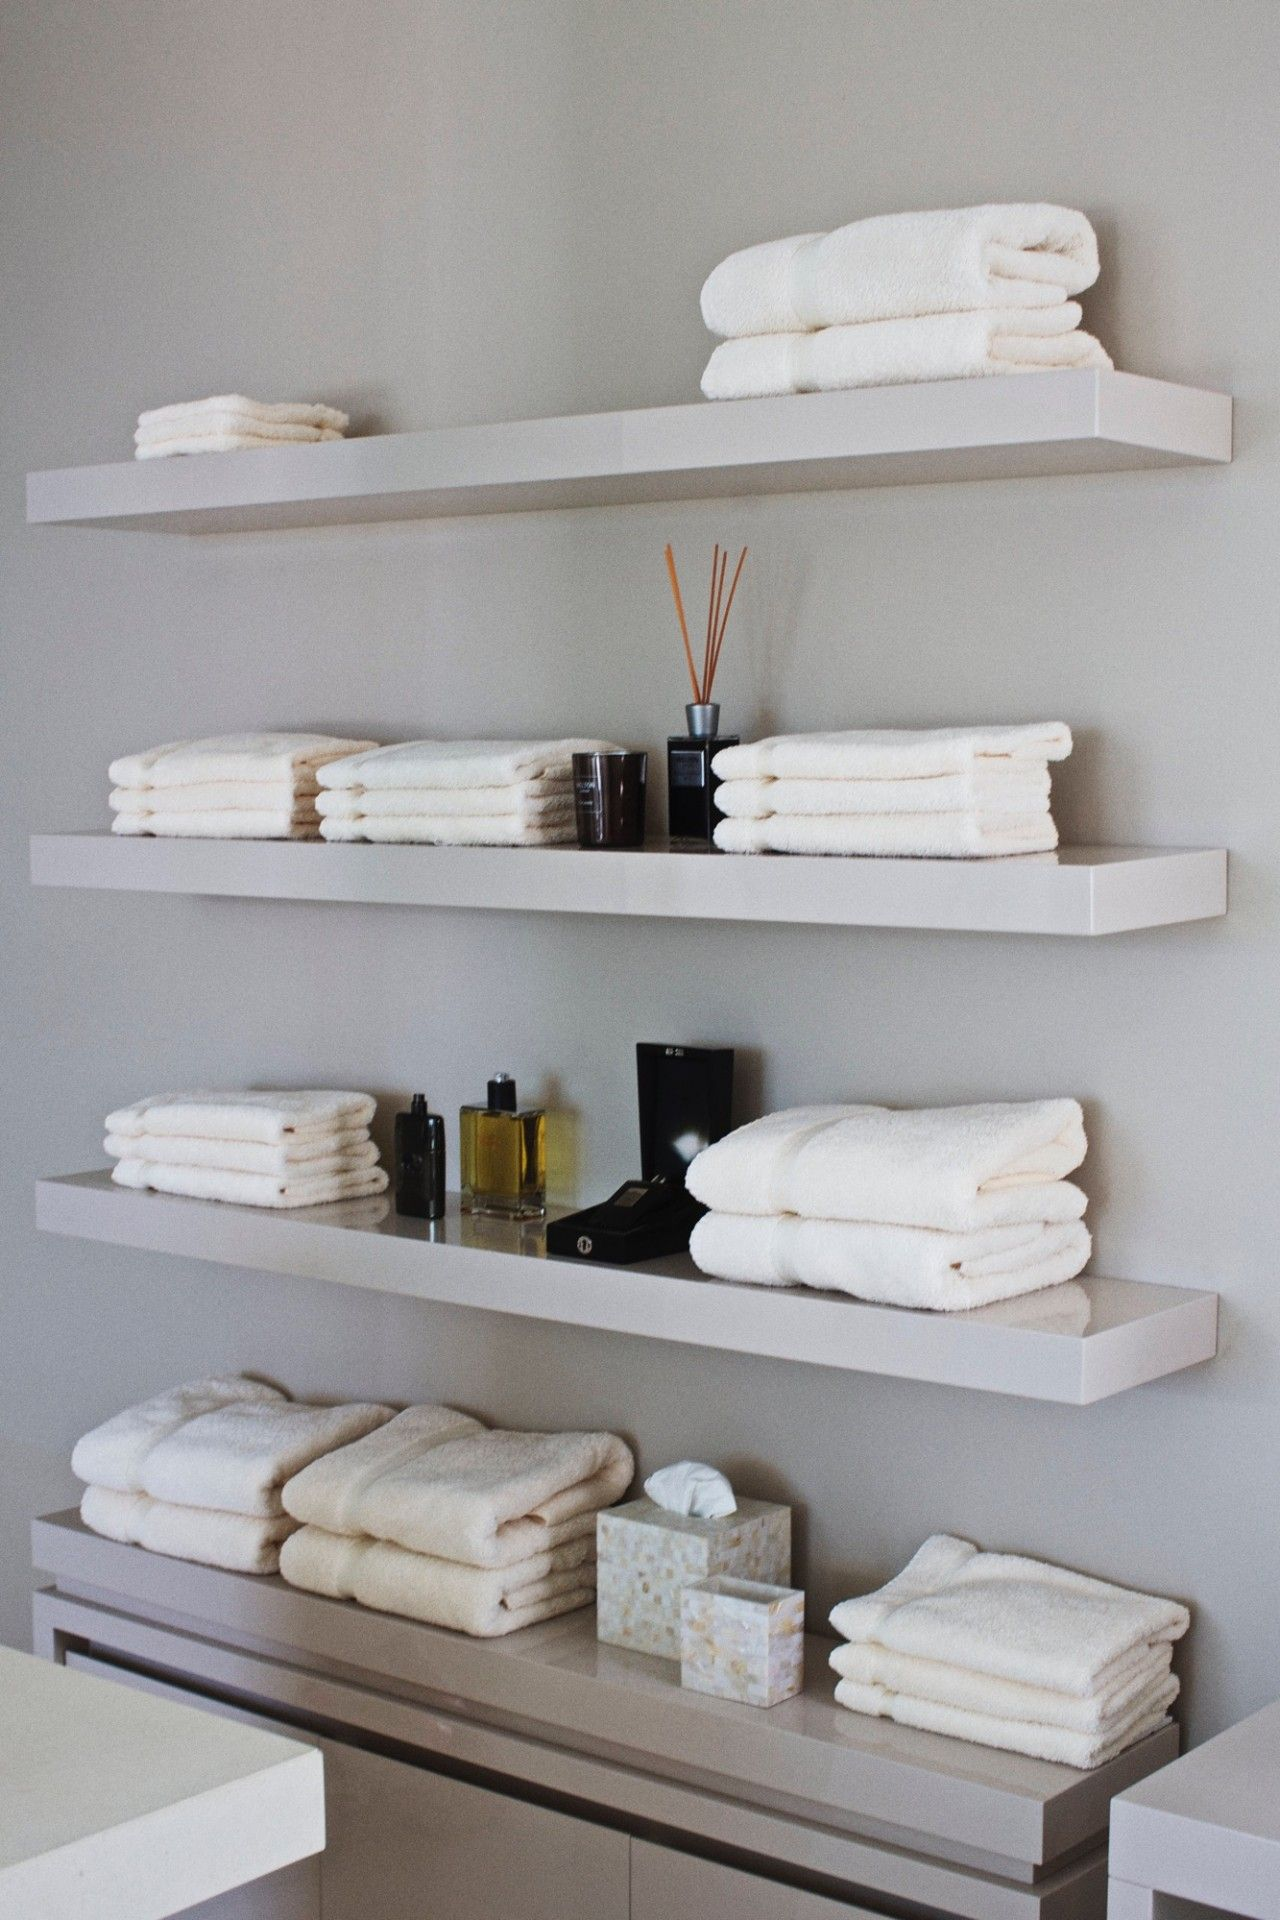 Wohndesign interieur badezimmer spain  ibiza  private residence  bath room  eric kuster